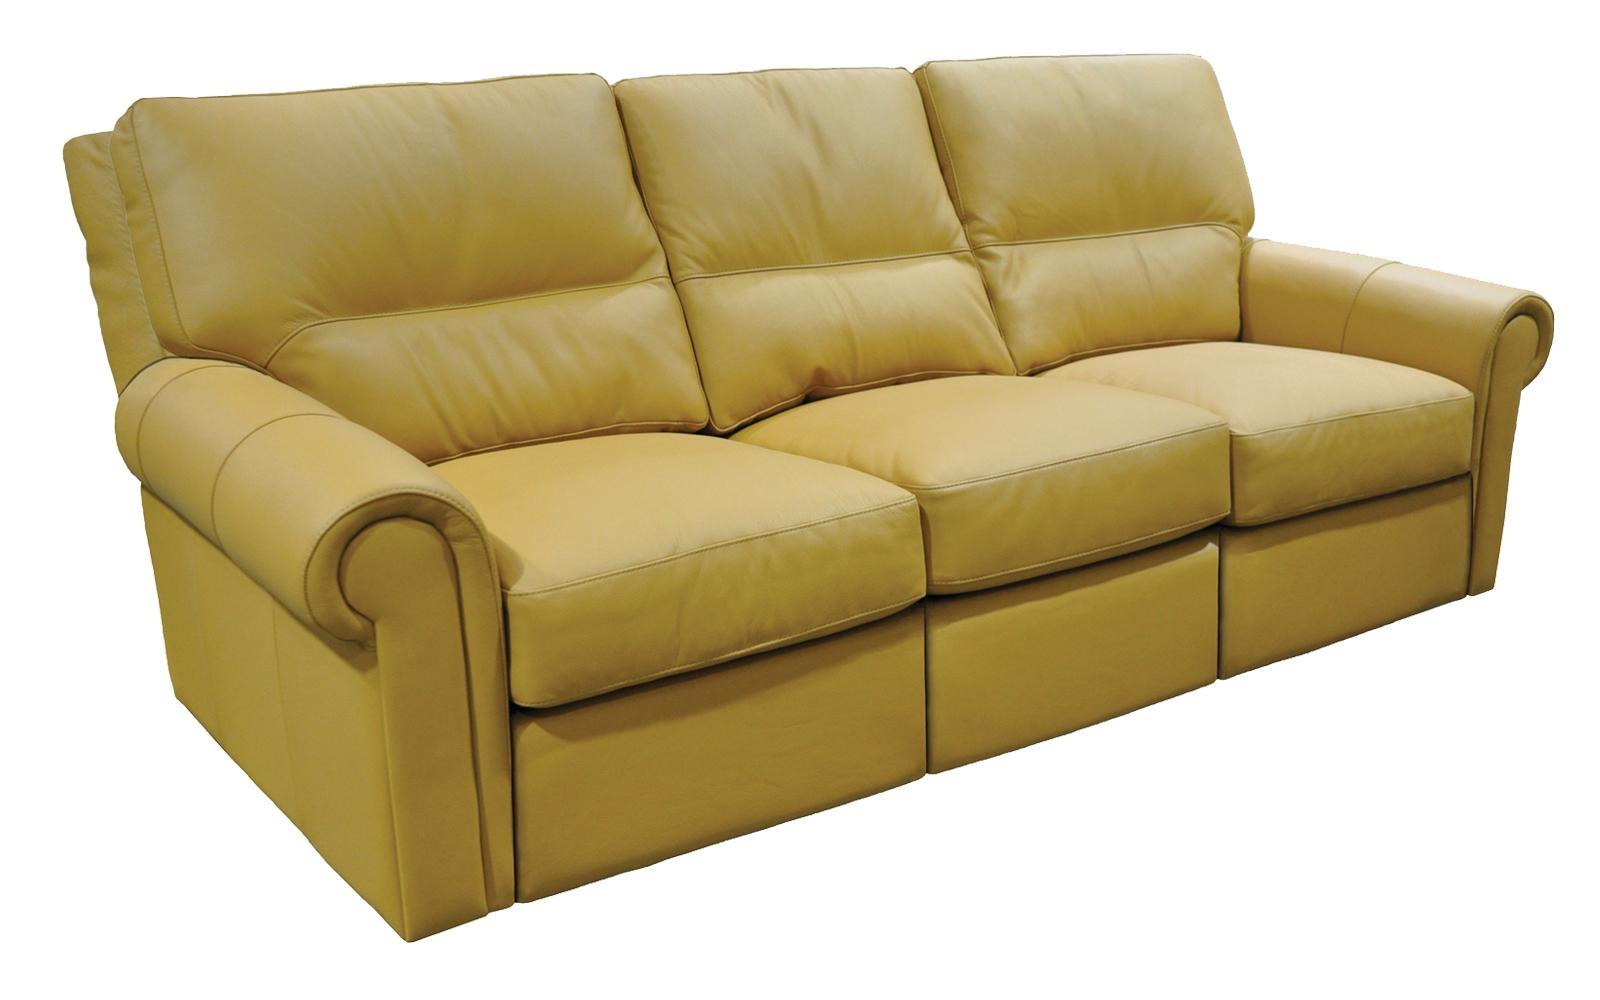 sofa beds denver co cindy crawford montclair sleeper 20 top sofas ideas